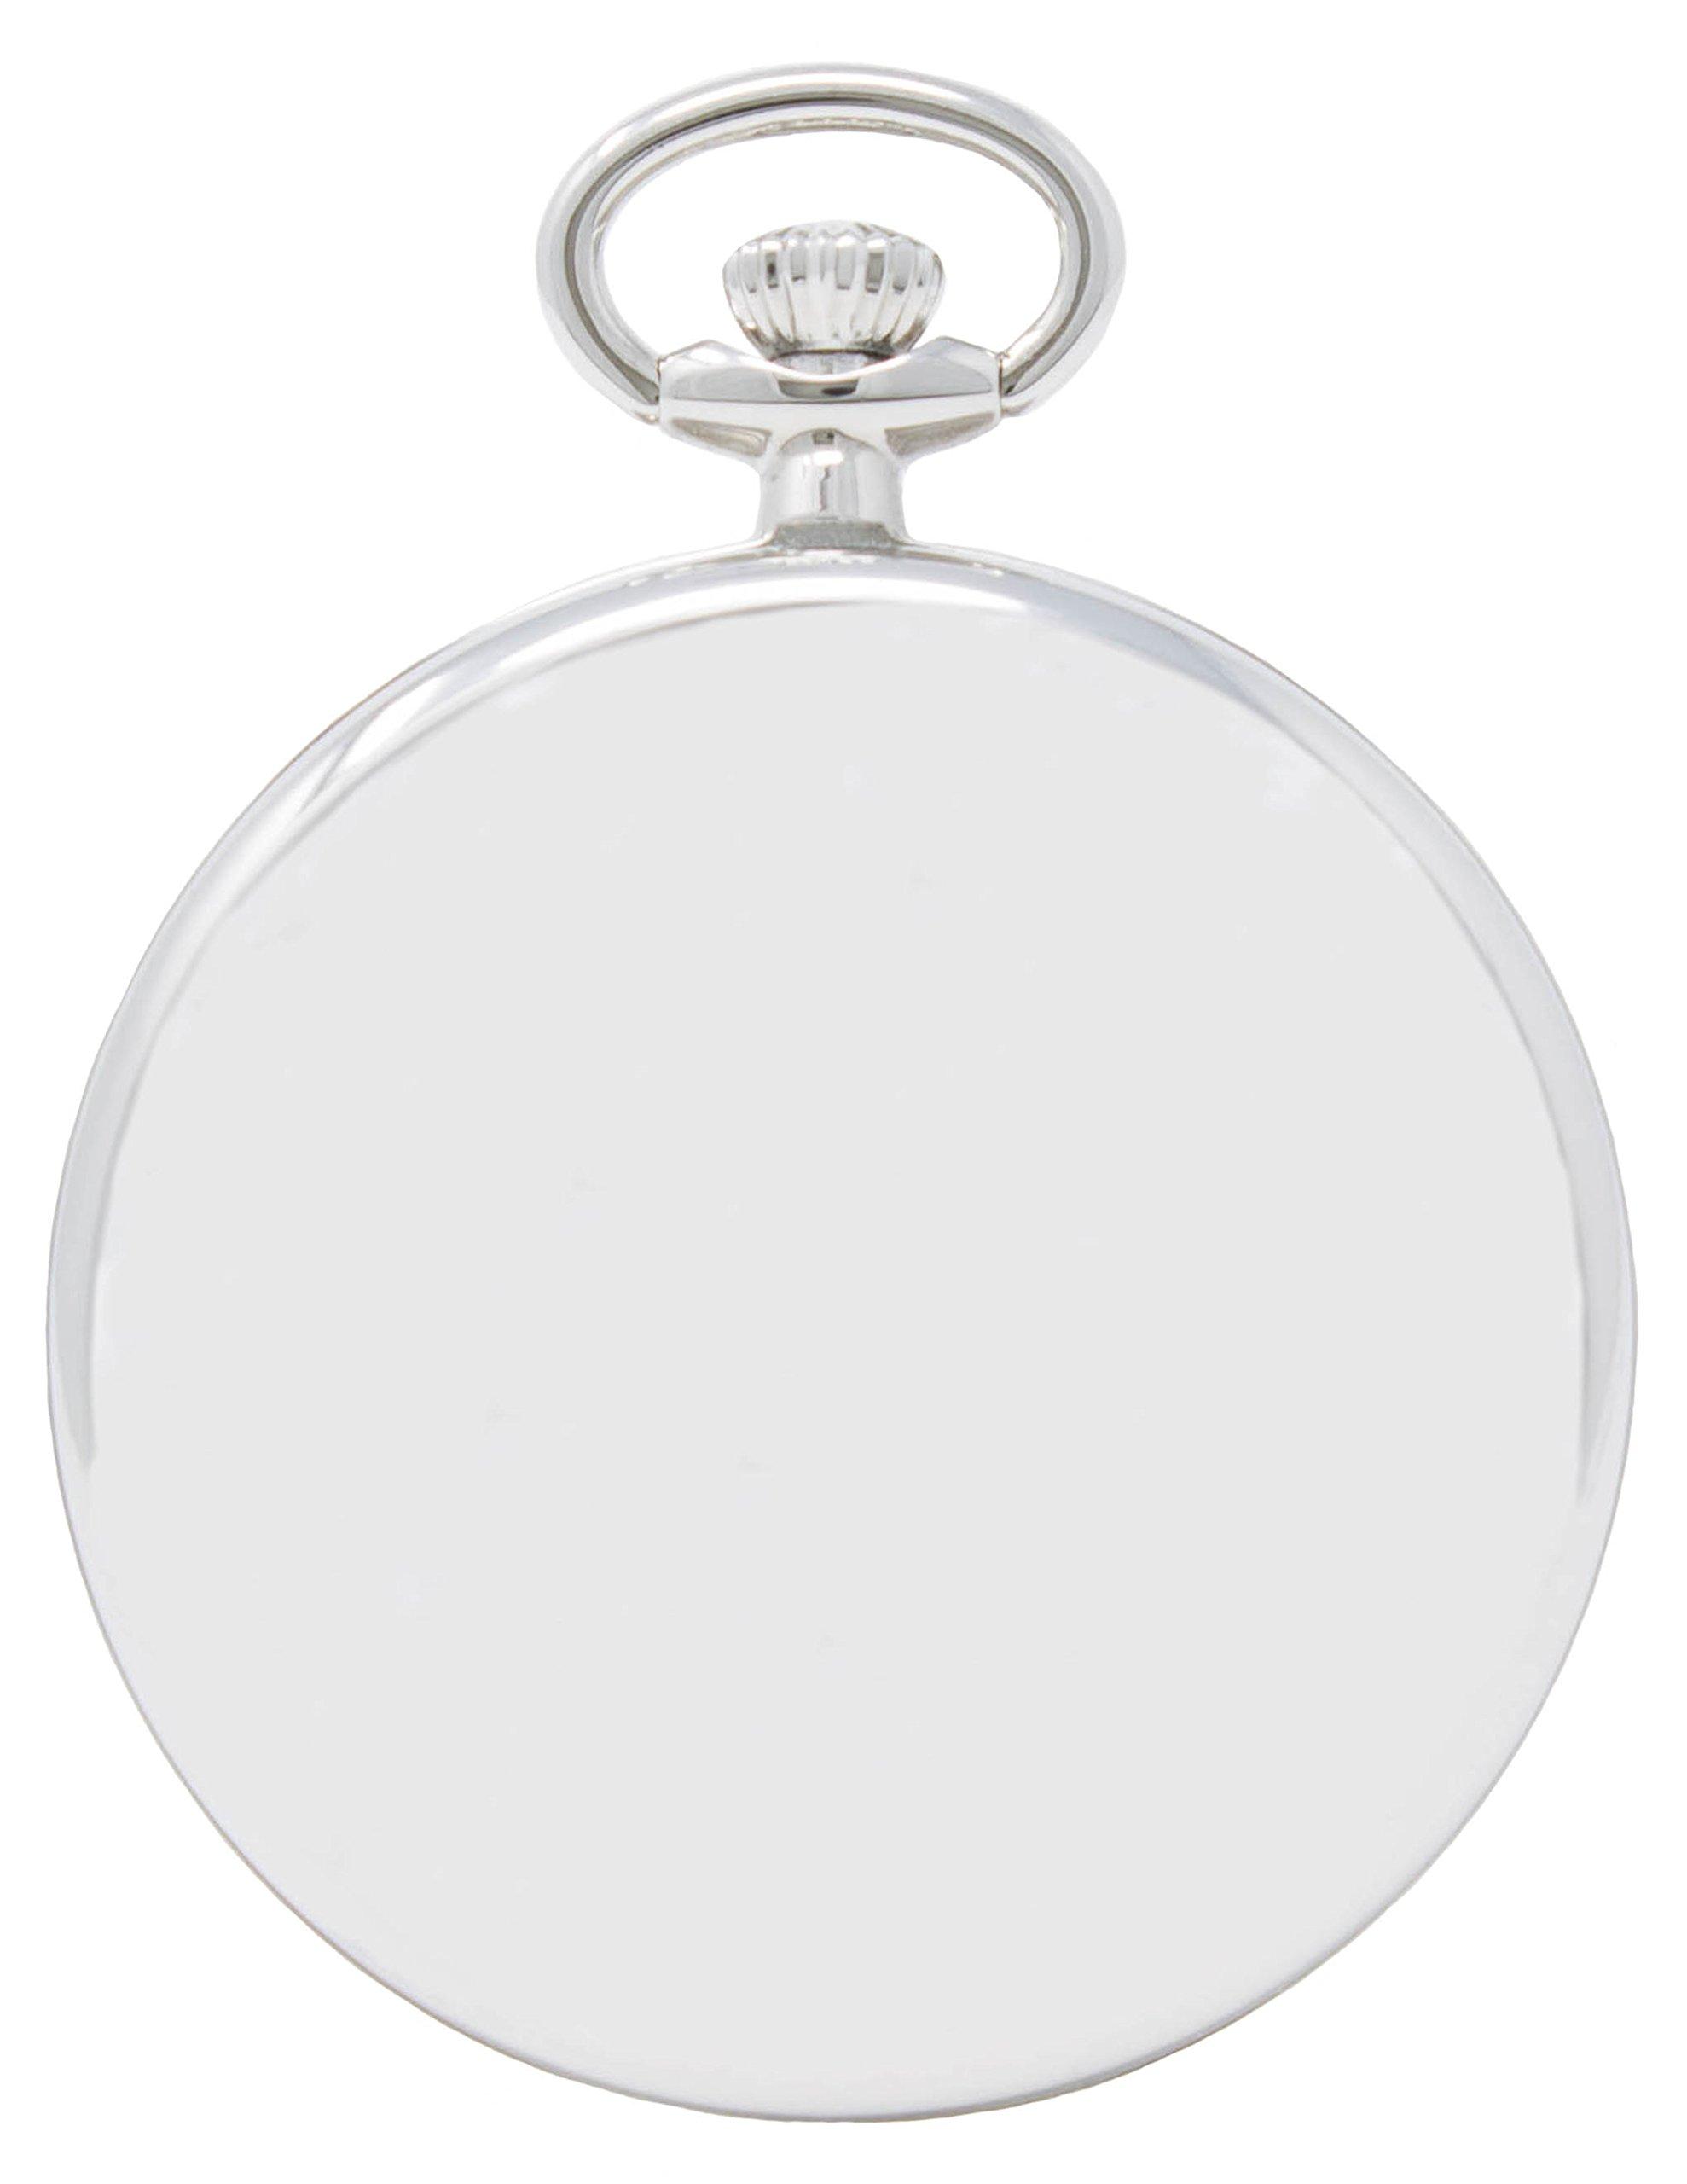 Engravable pocket watch by Dakota, Silver by Dakota (Image #2)